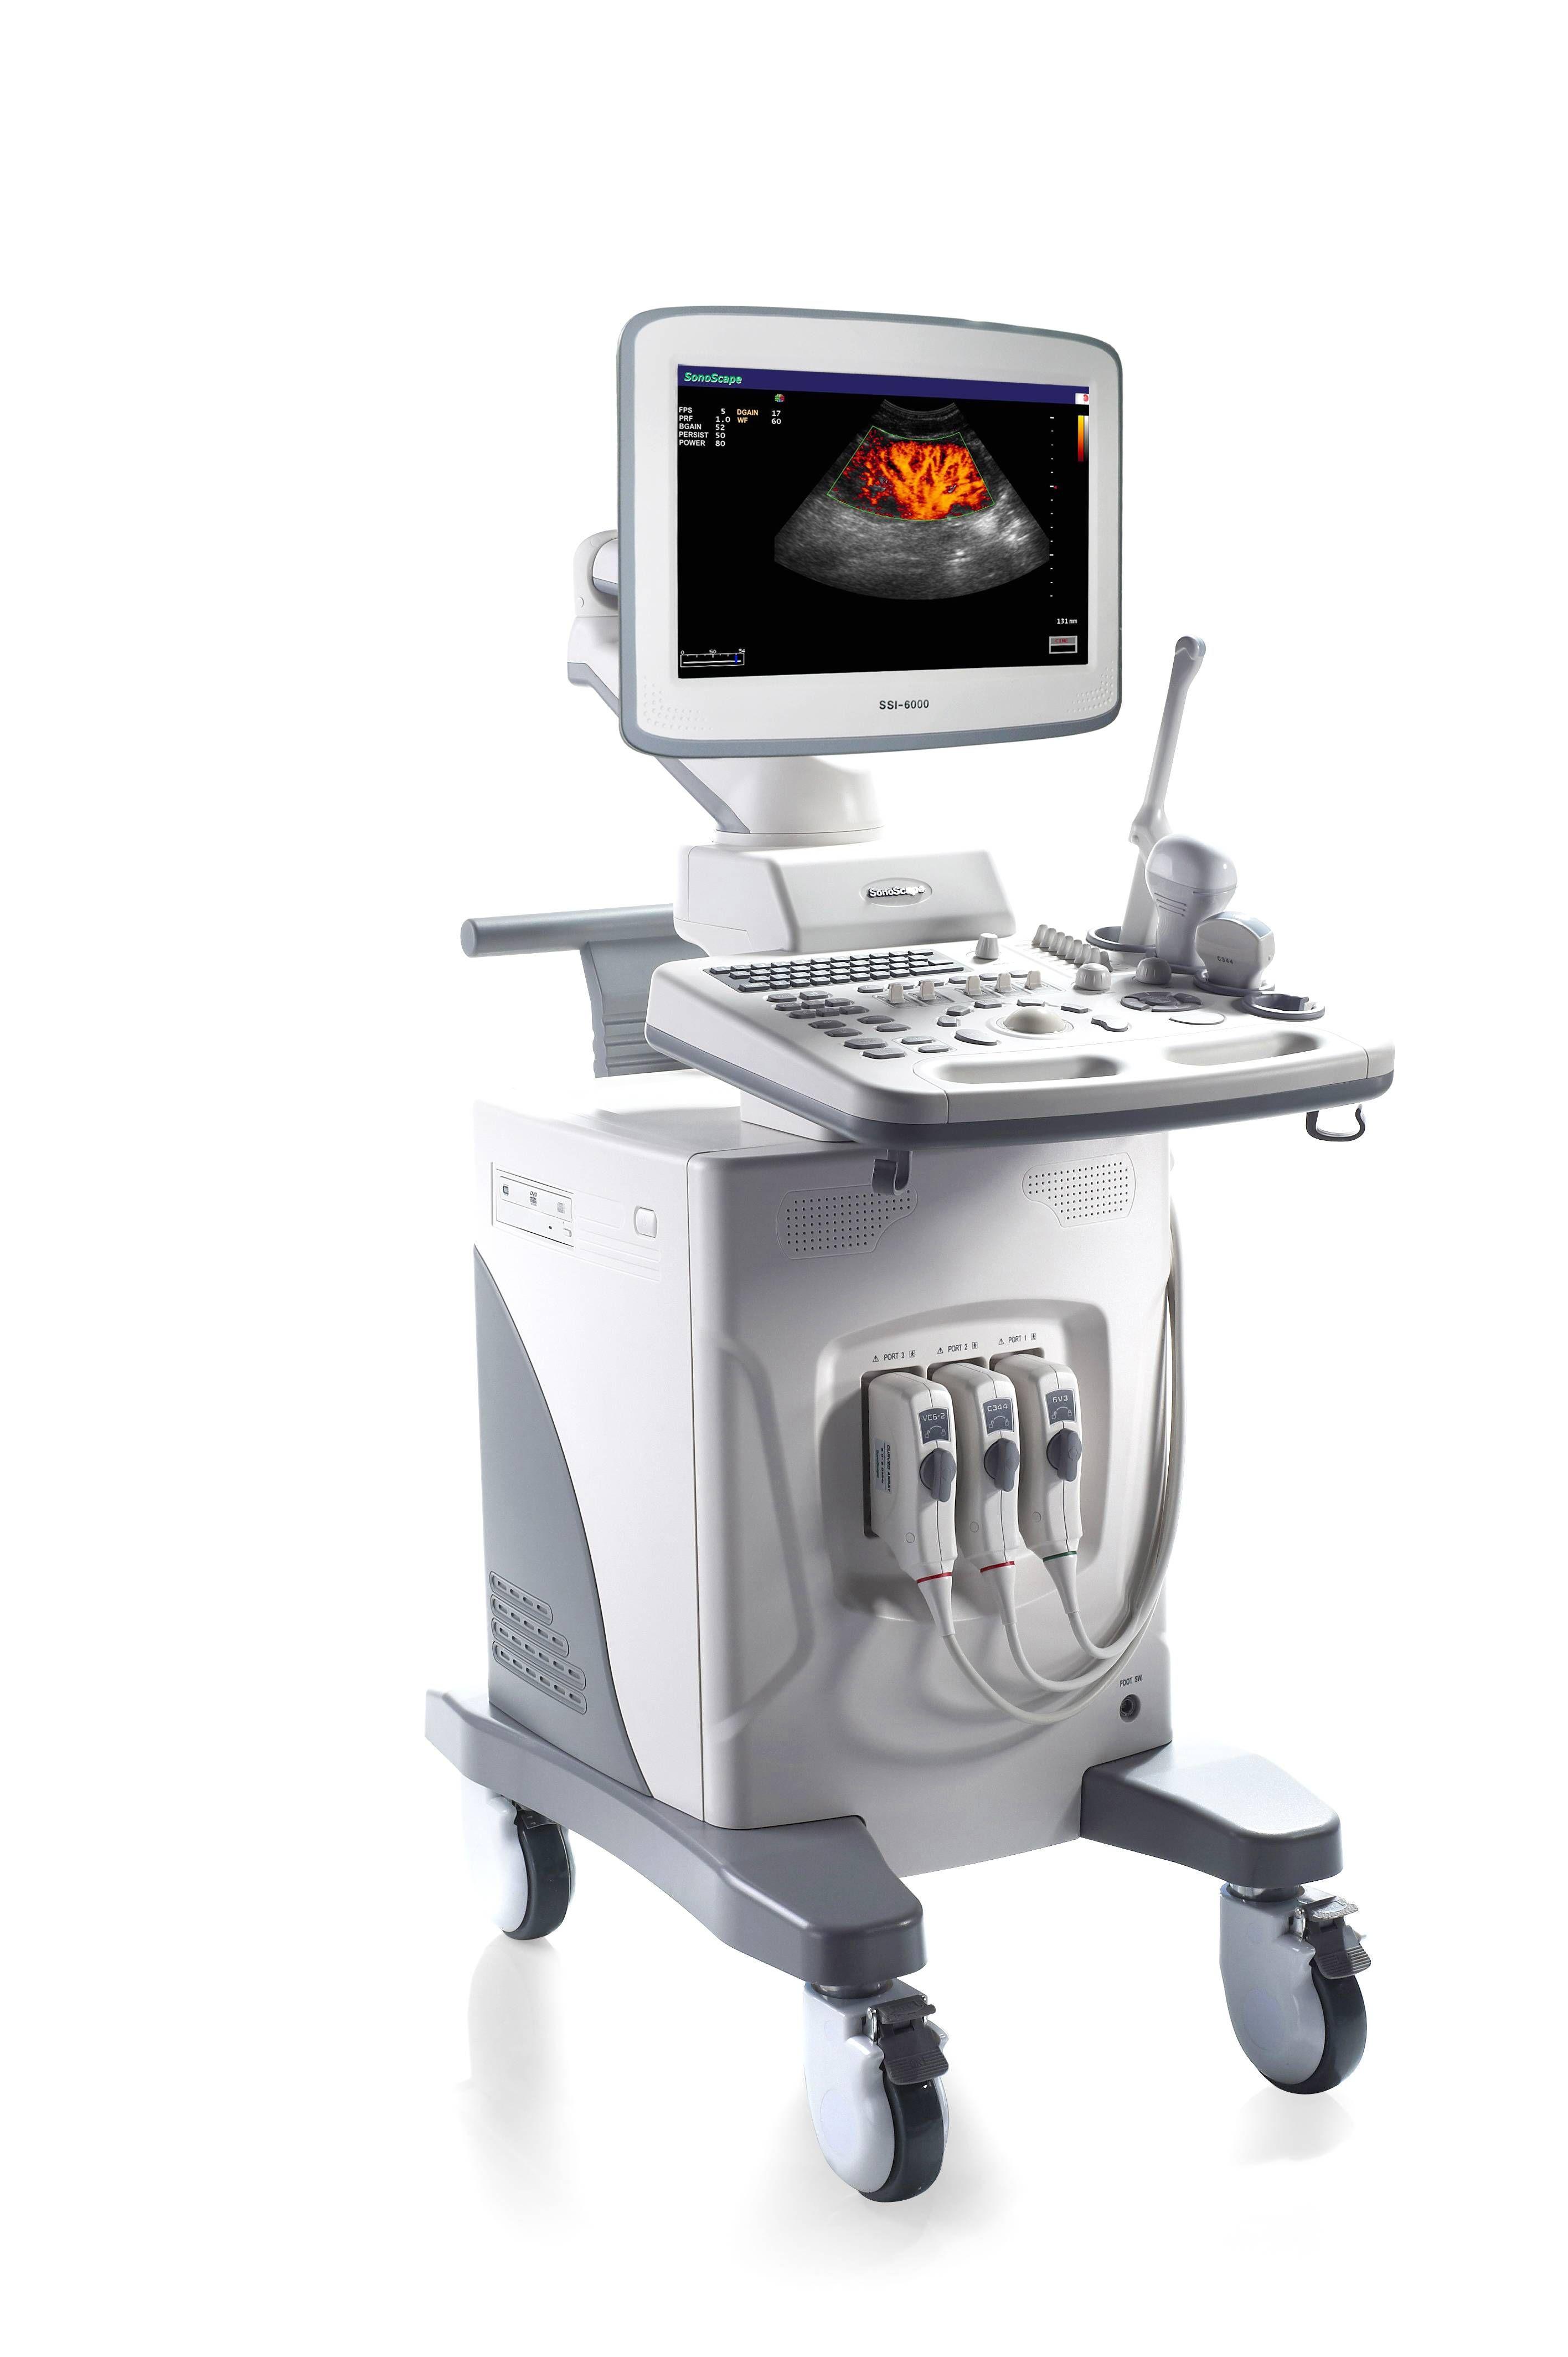 Sonoscape Ssi 6000 Shared Service Ultrasound Model